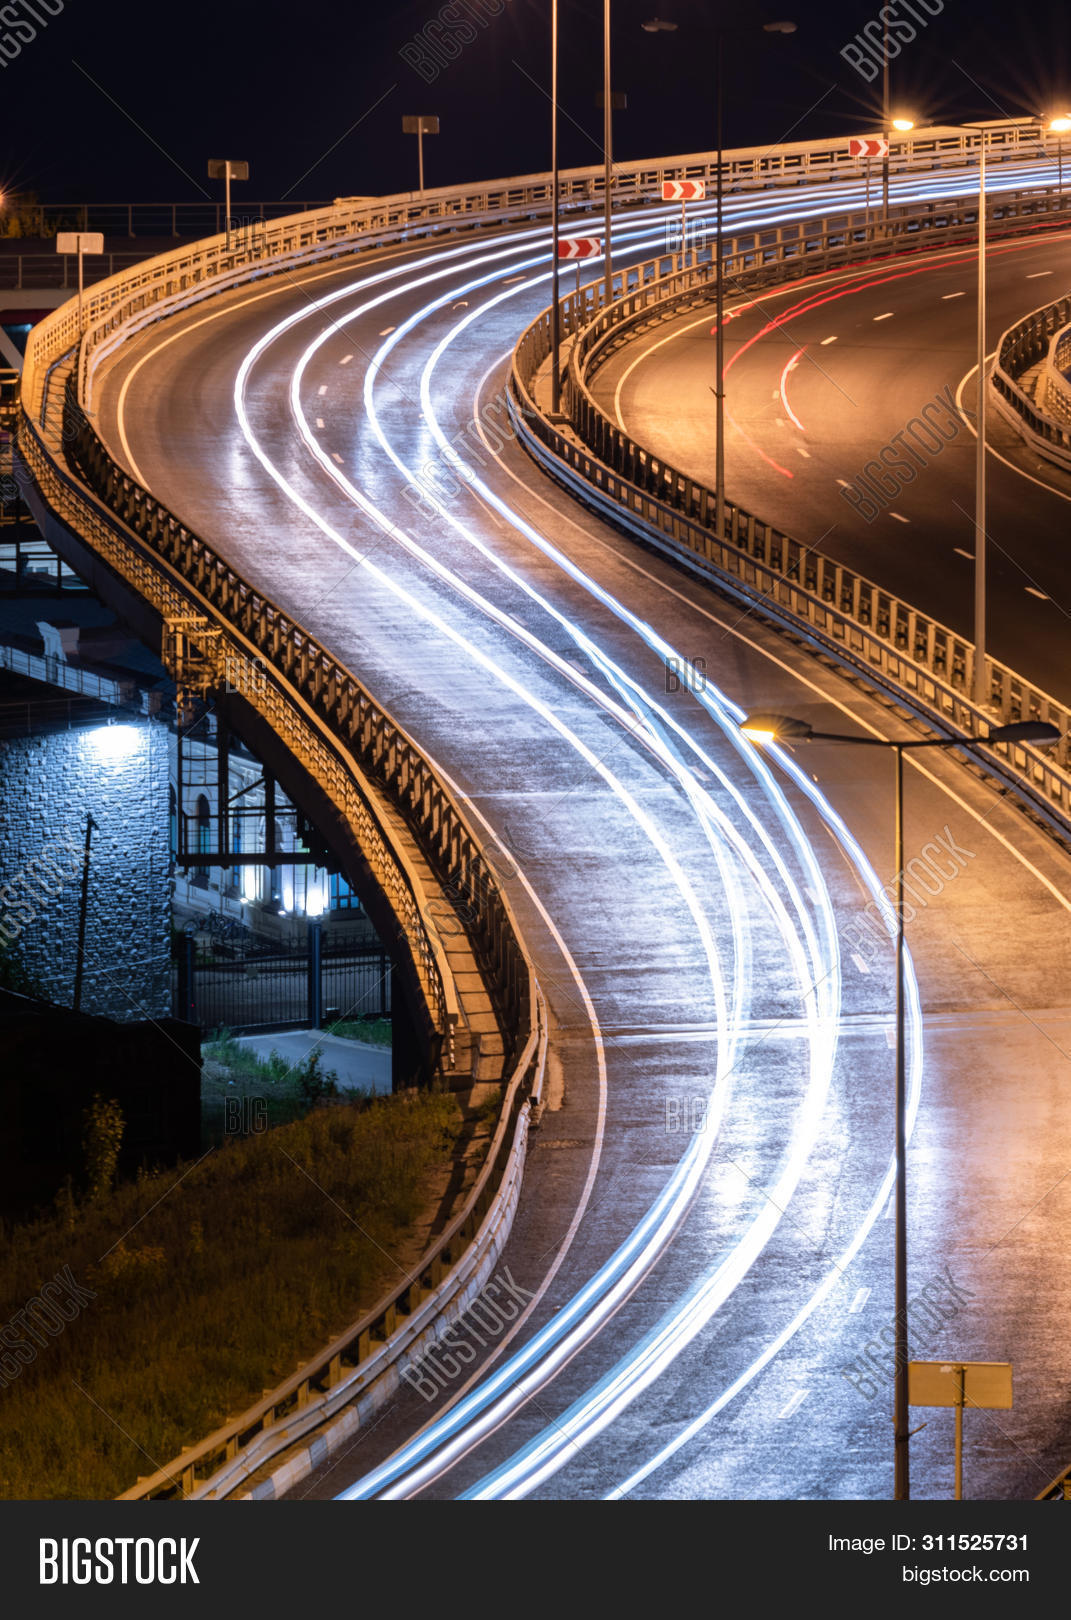 Interchange Bridge Image Photo Free Trial Bigstock